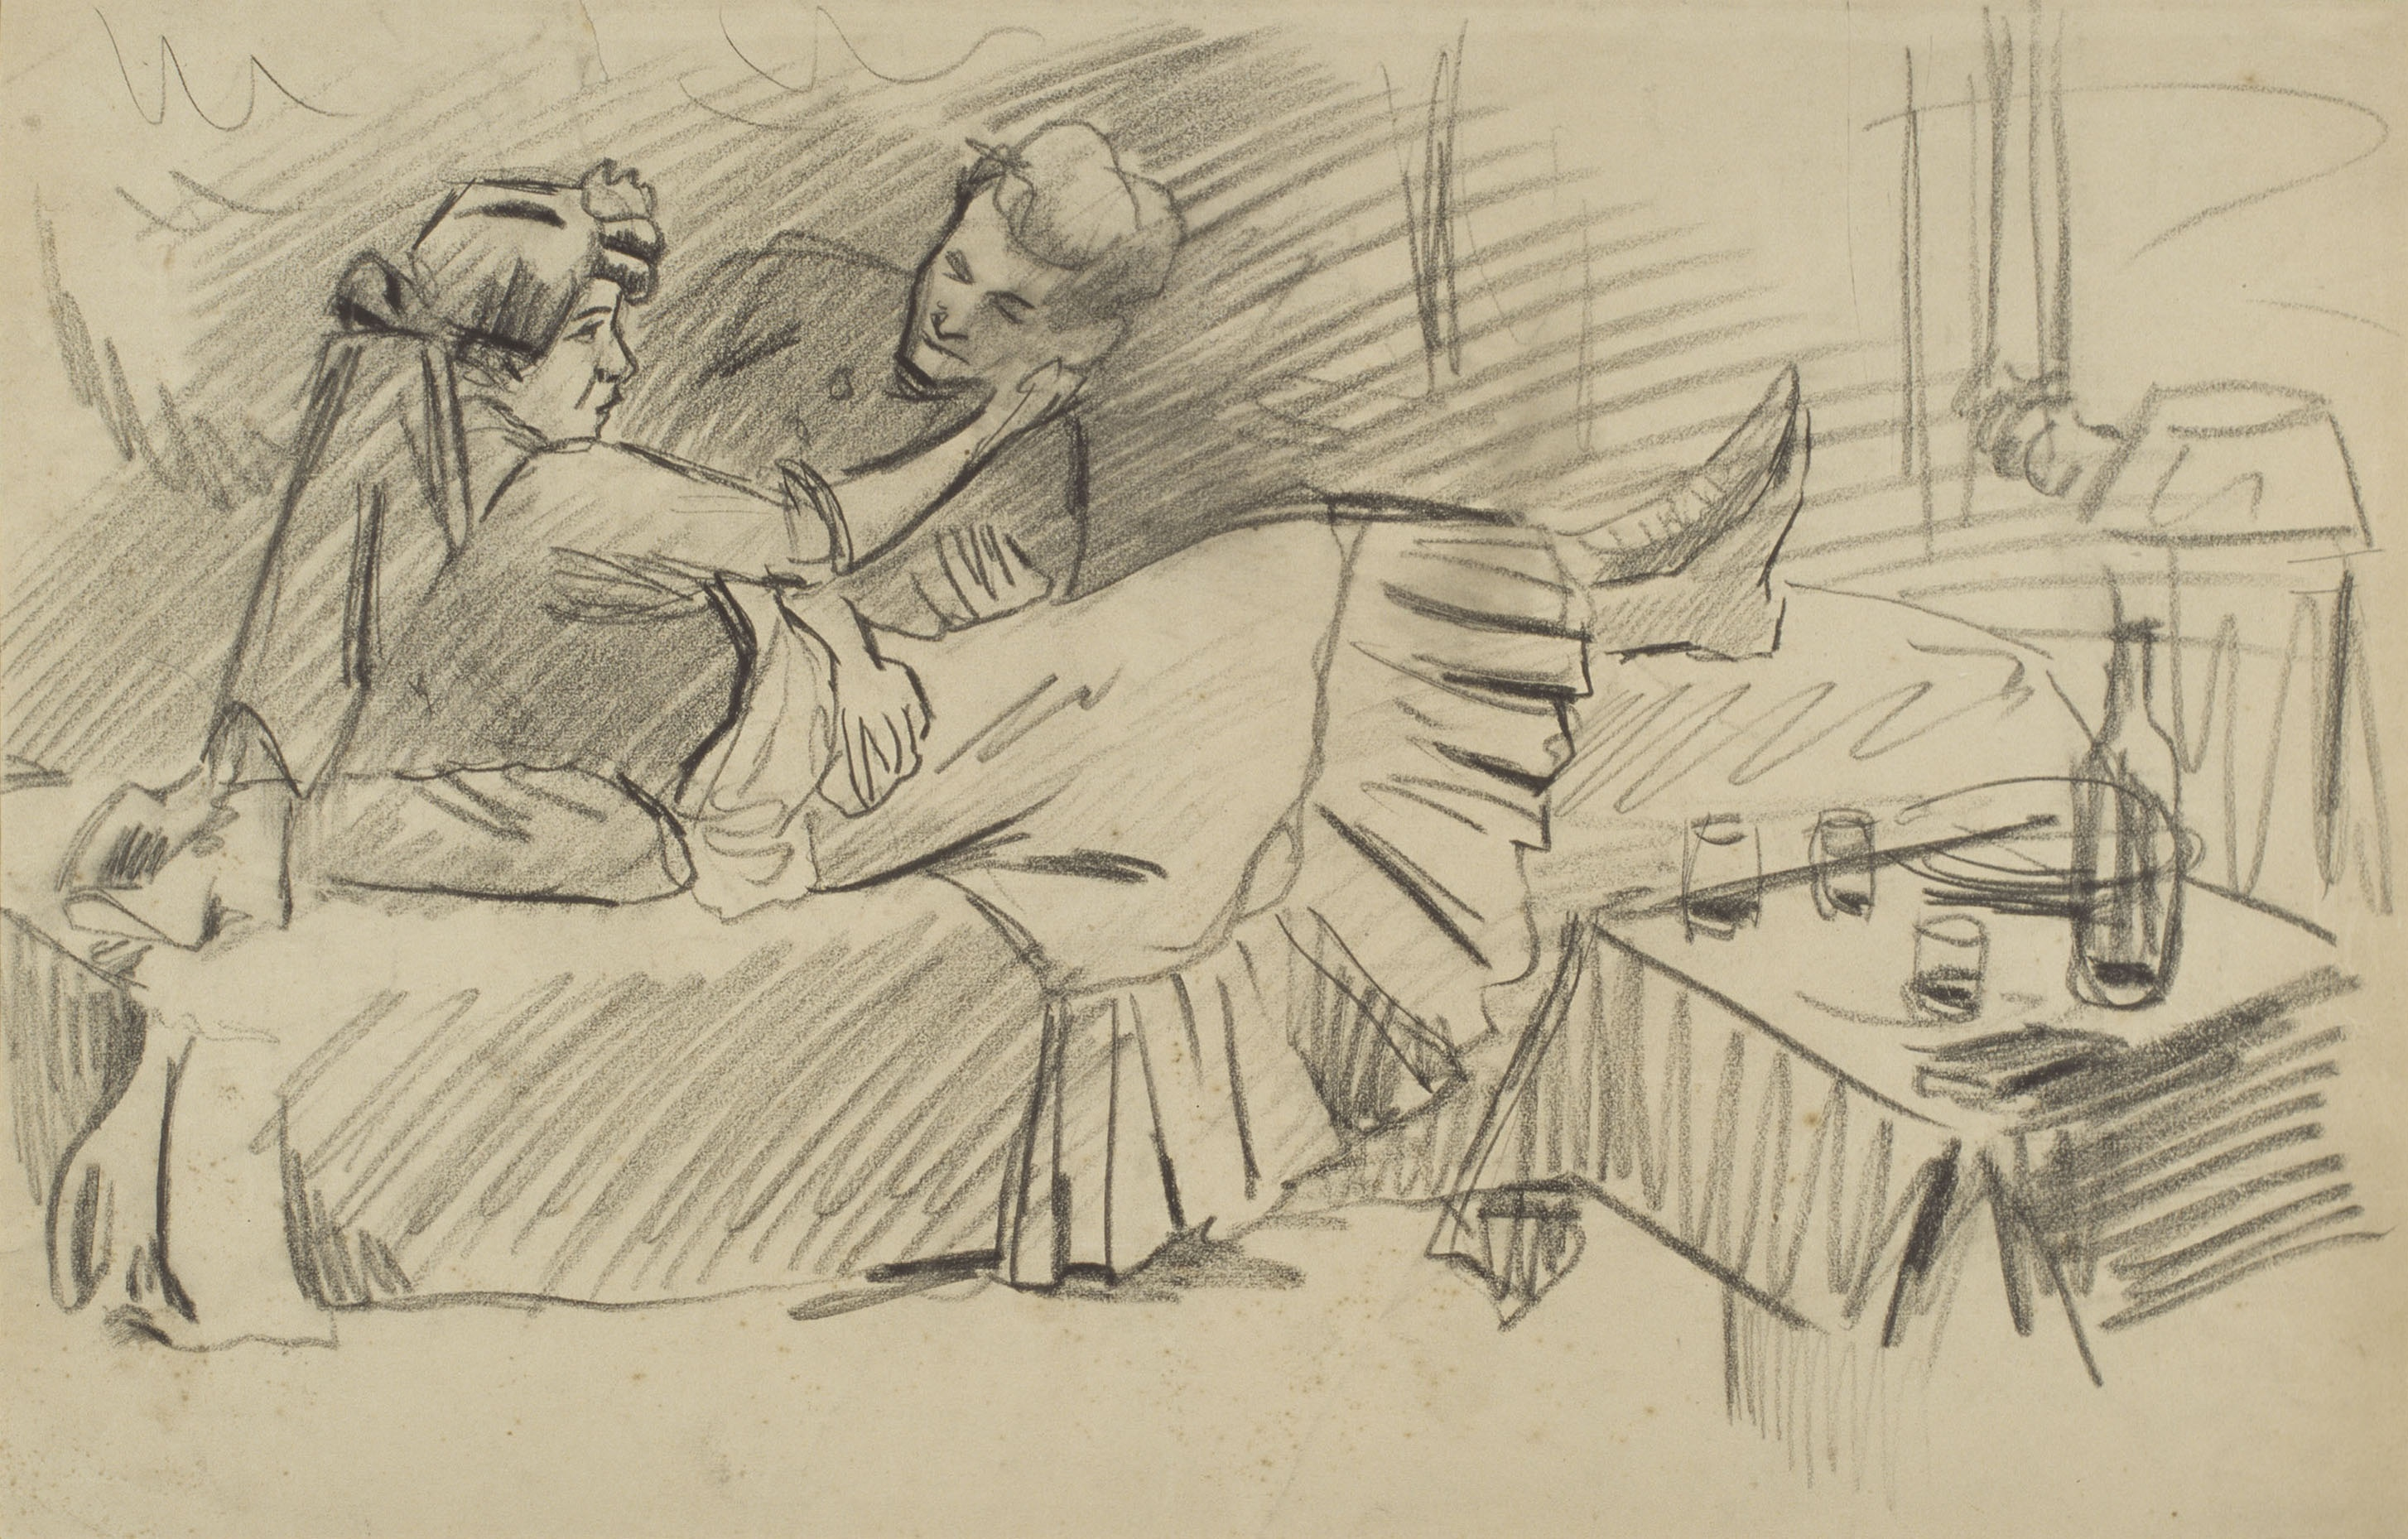 Juli González - Cita amorosa (Rendez-vous amoreux) - Cap a 1910-1914